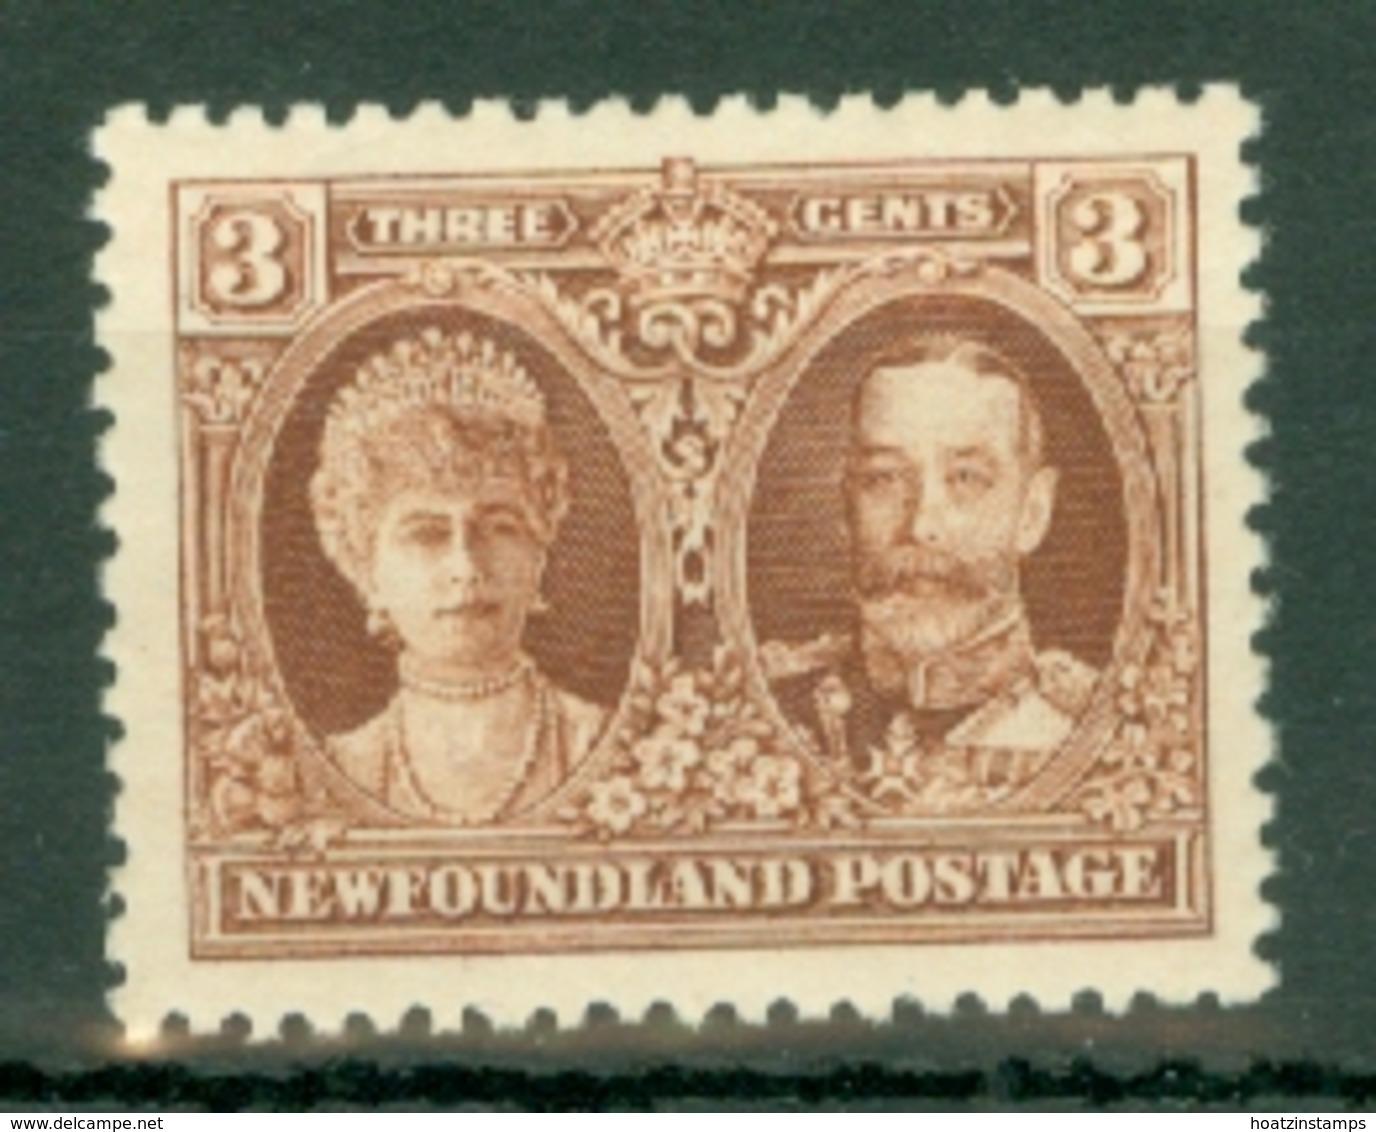 Newfoundland: 1929/31   Publicity Issue [Perkins, Bacon]  SG181     3c      MH - Newfoundland